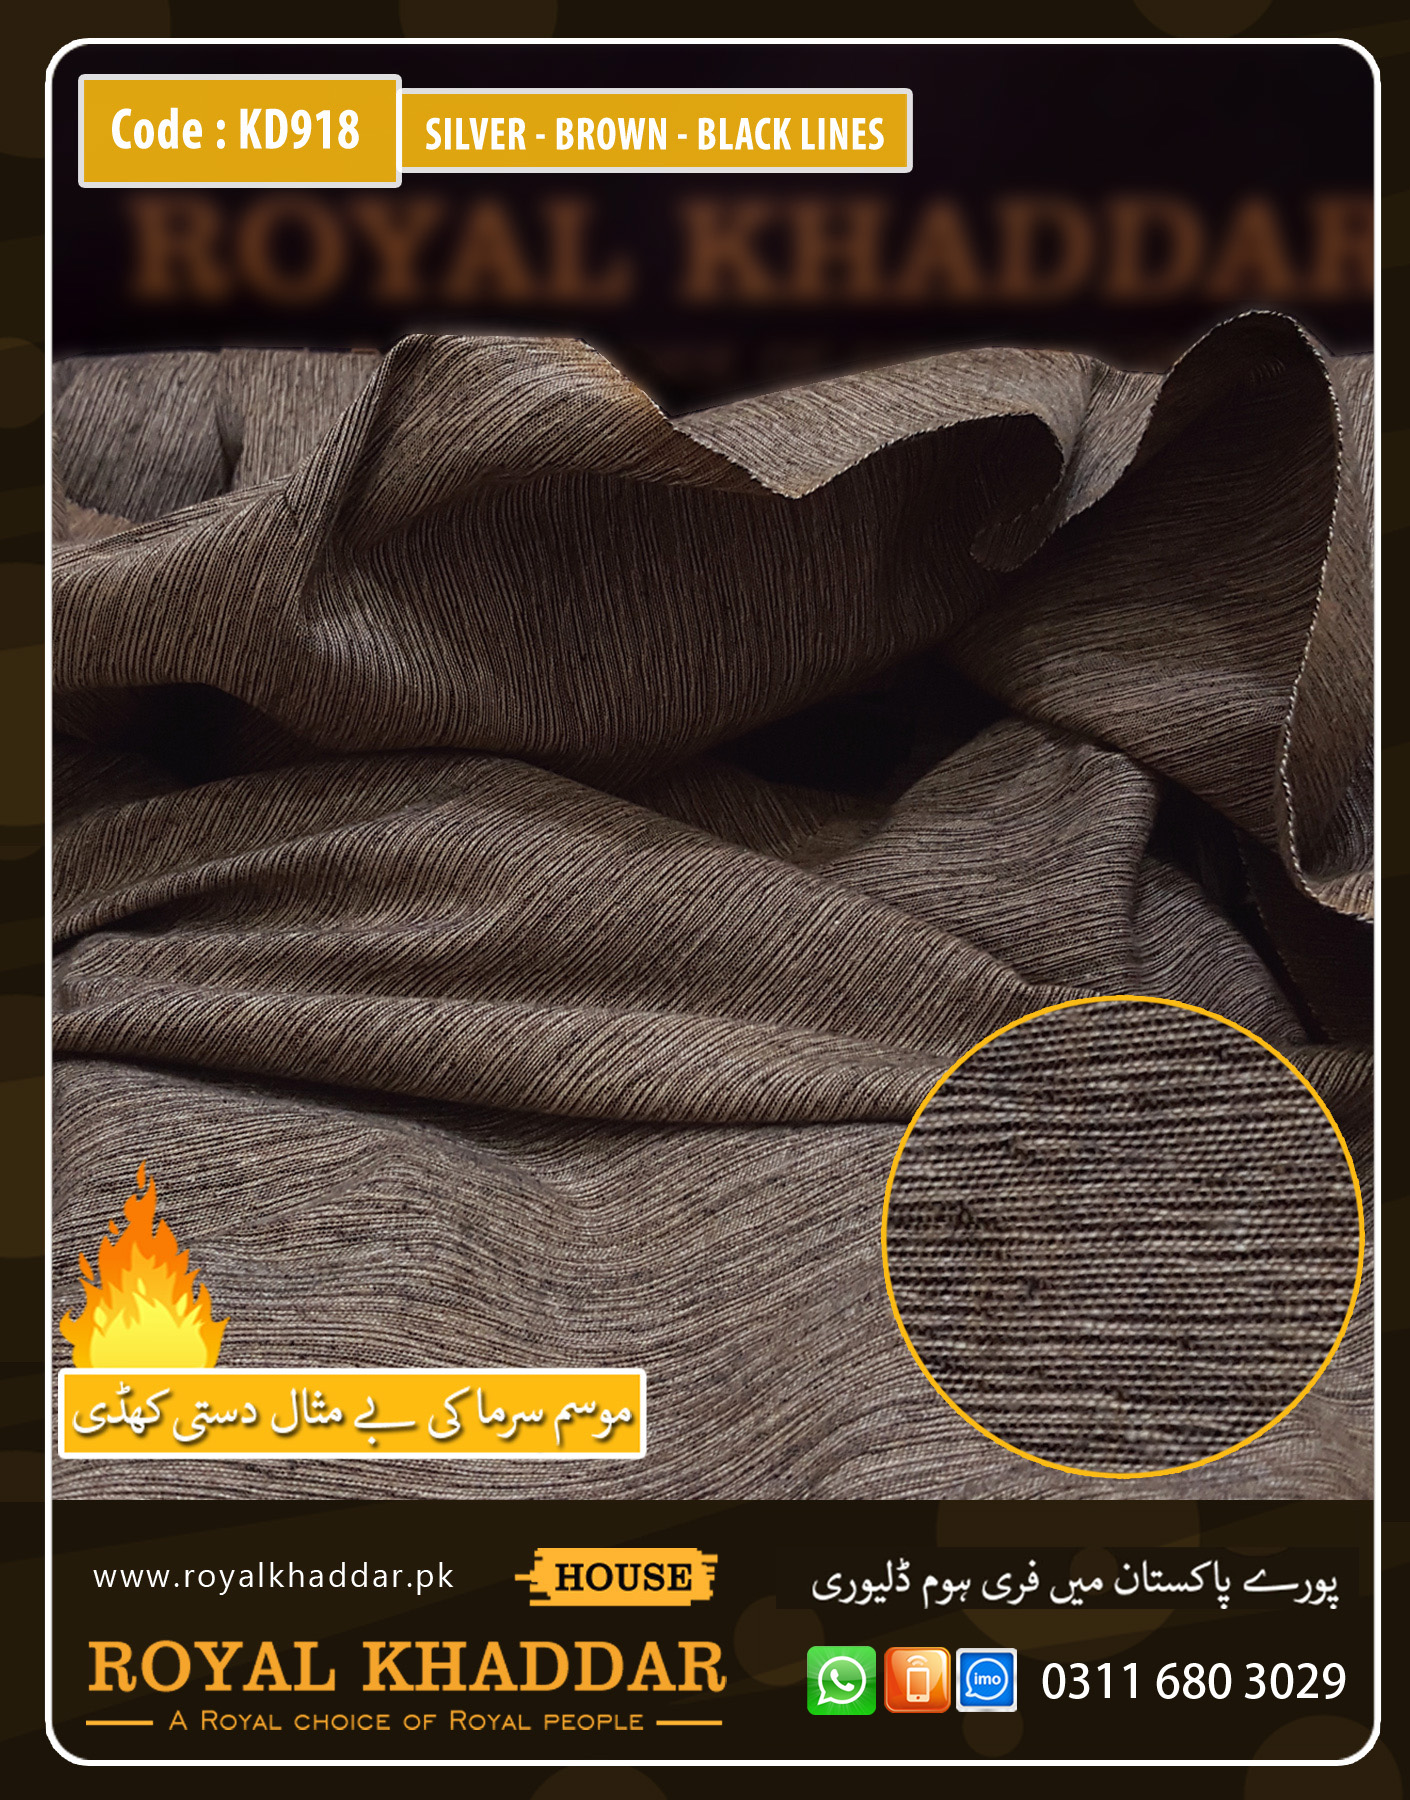 KD918 Silver - Brown Black Lines Handmade Khaddi